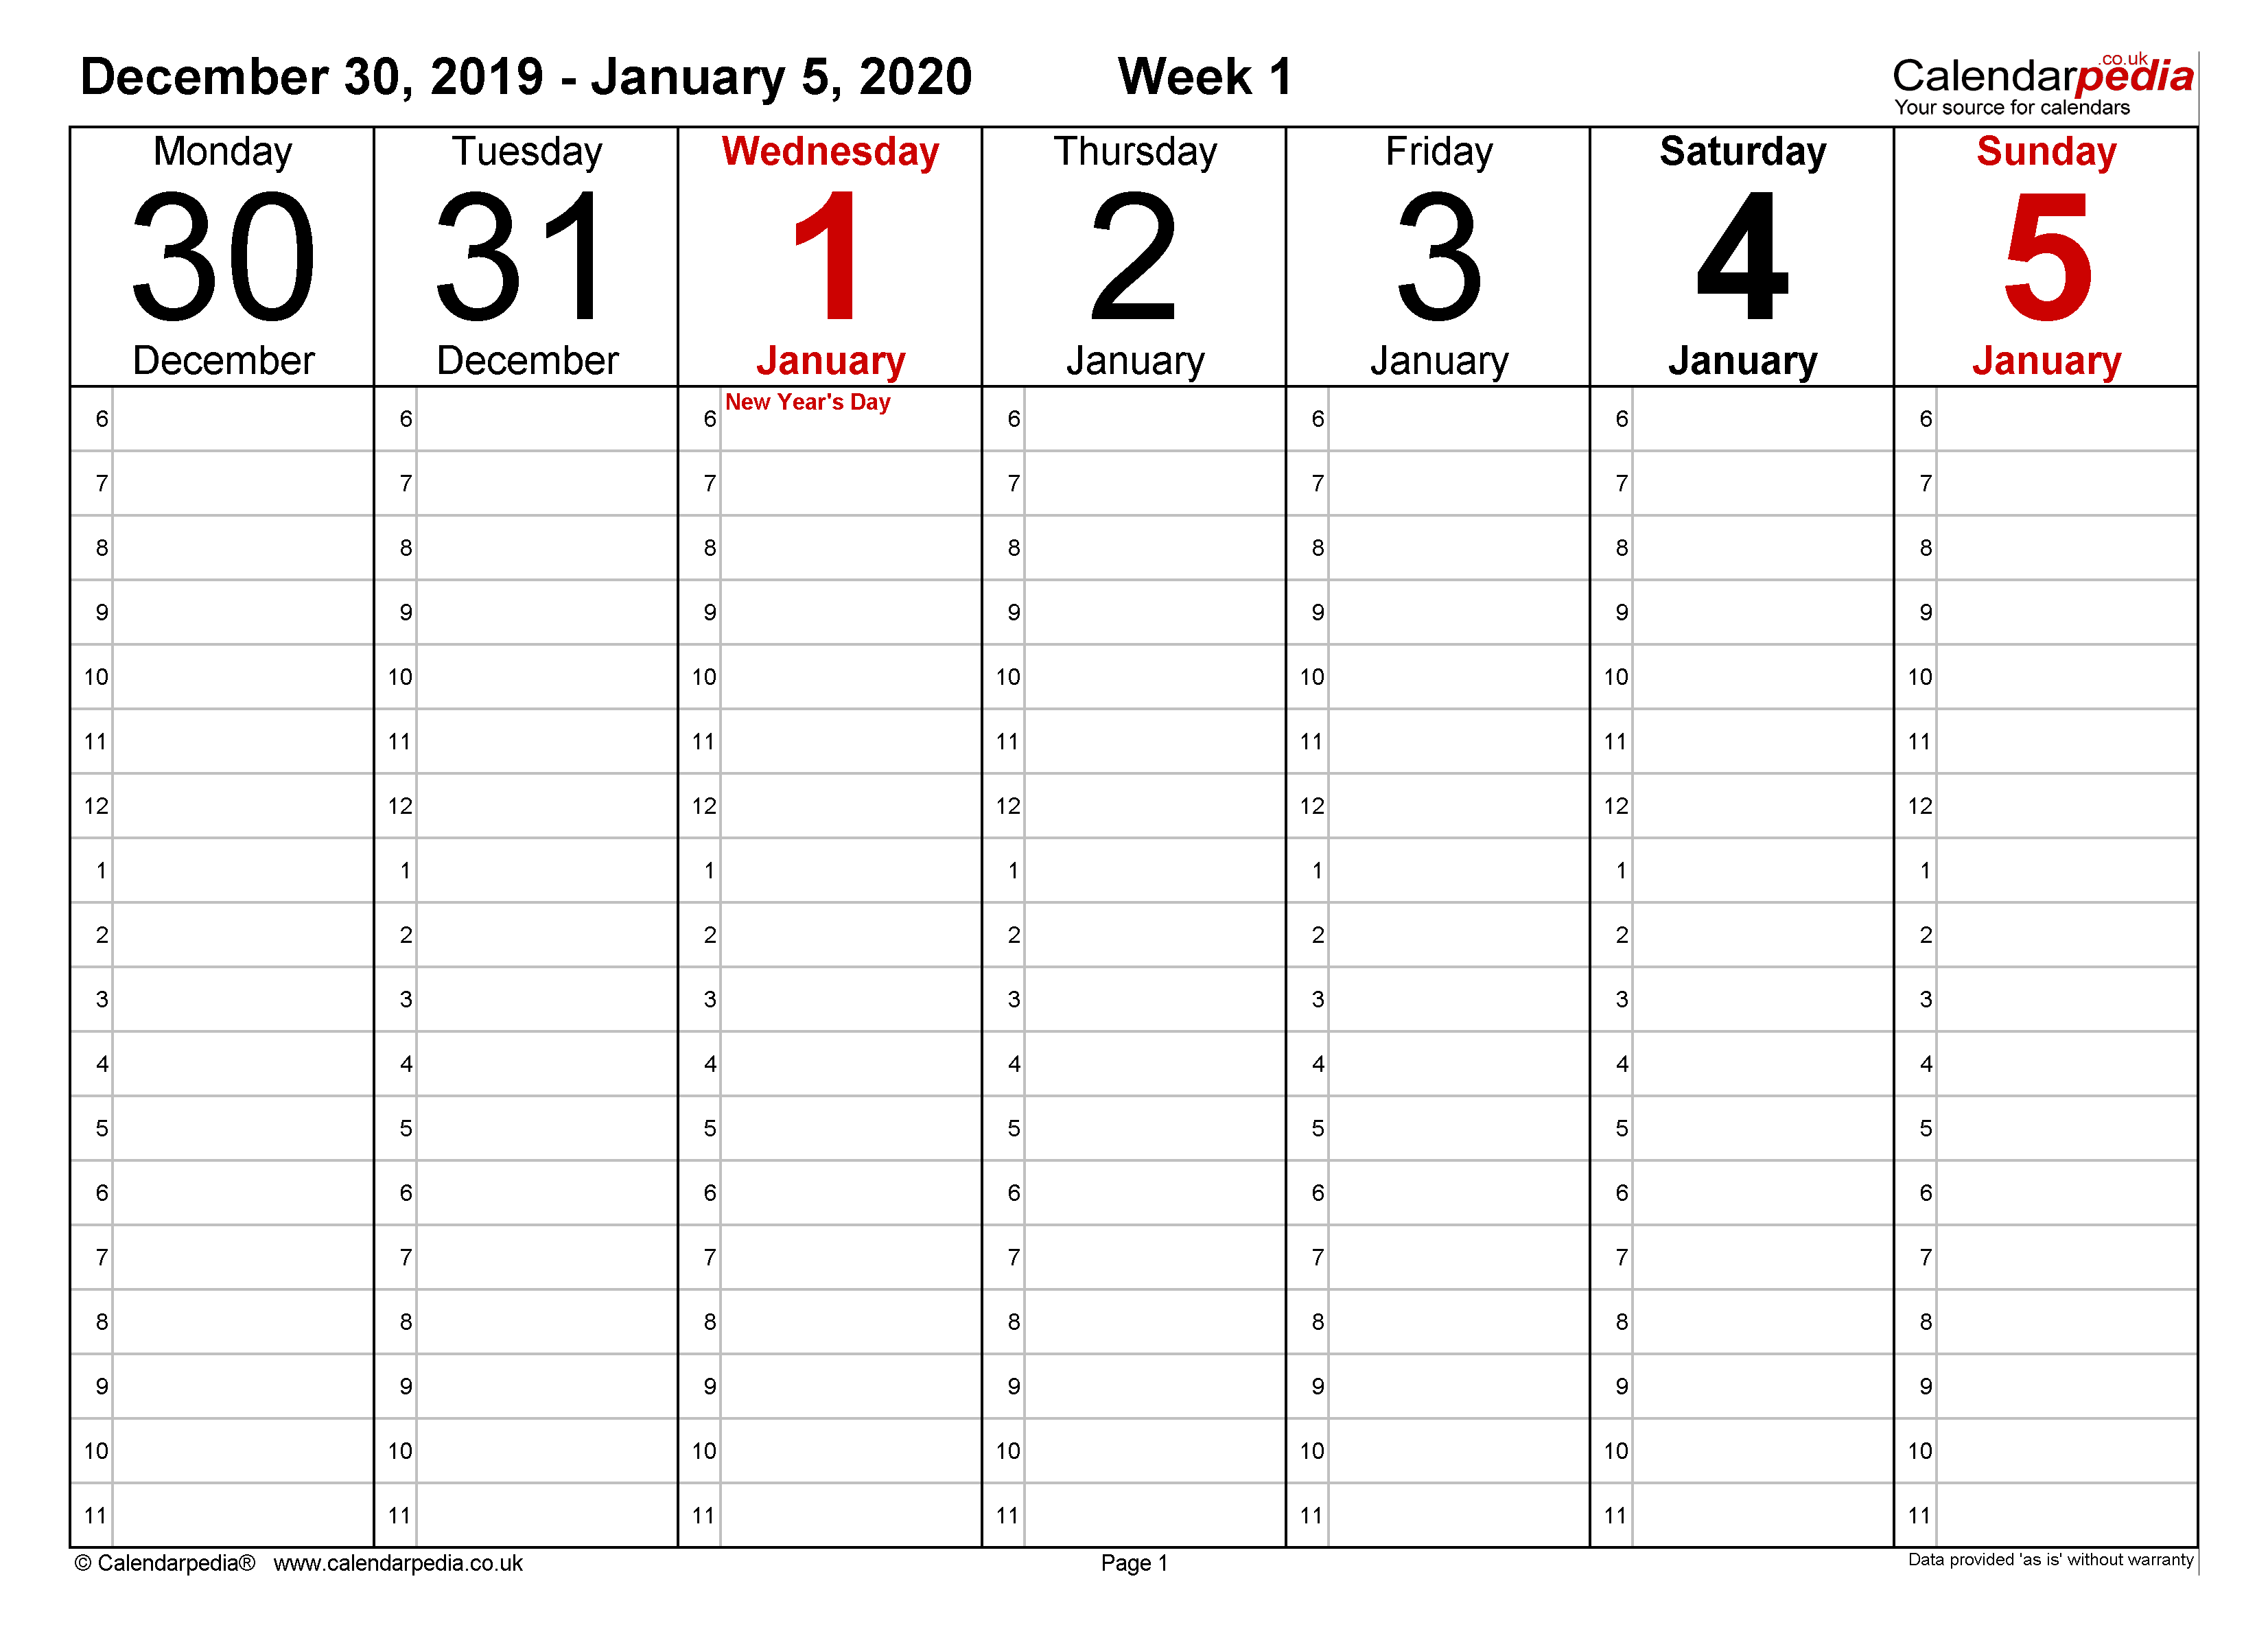 Weekly calendar 2020 UK - free printable templates for Word